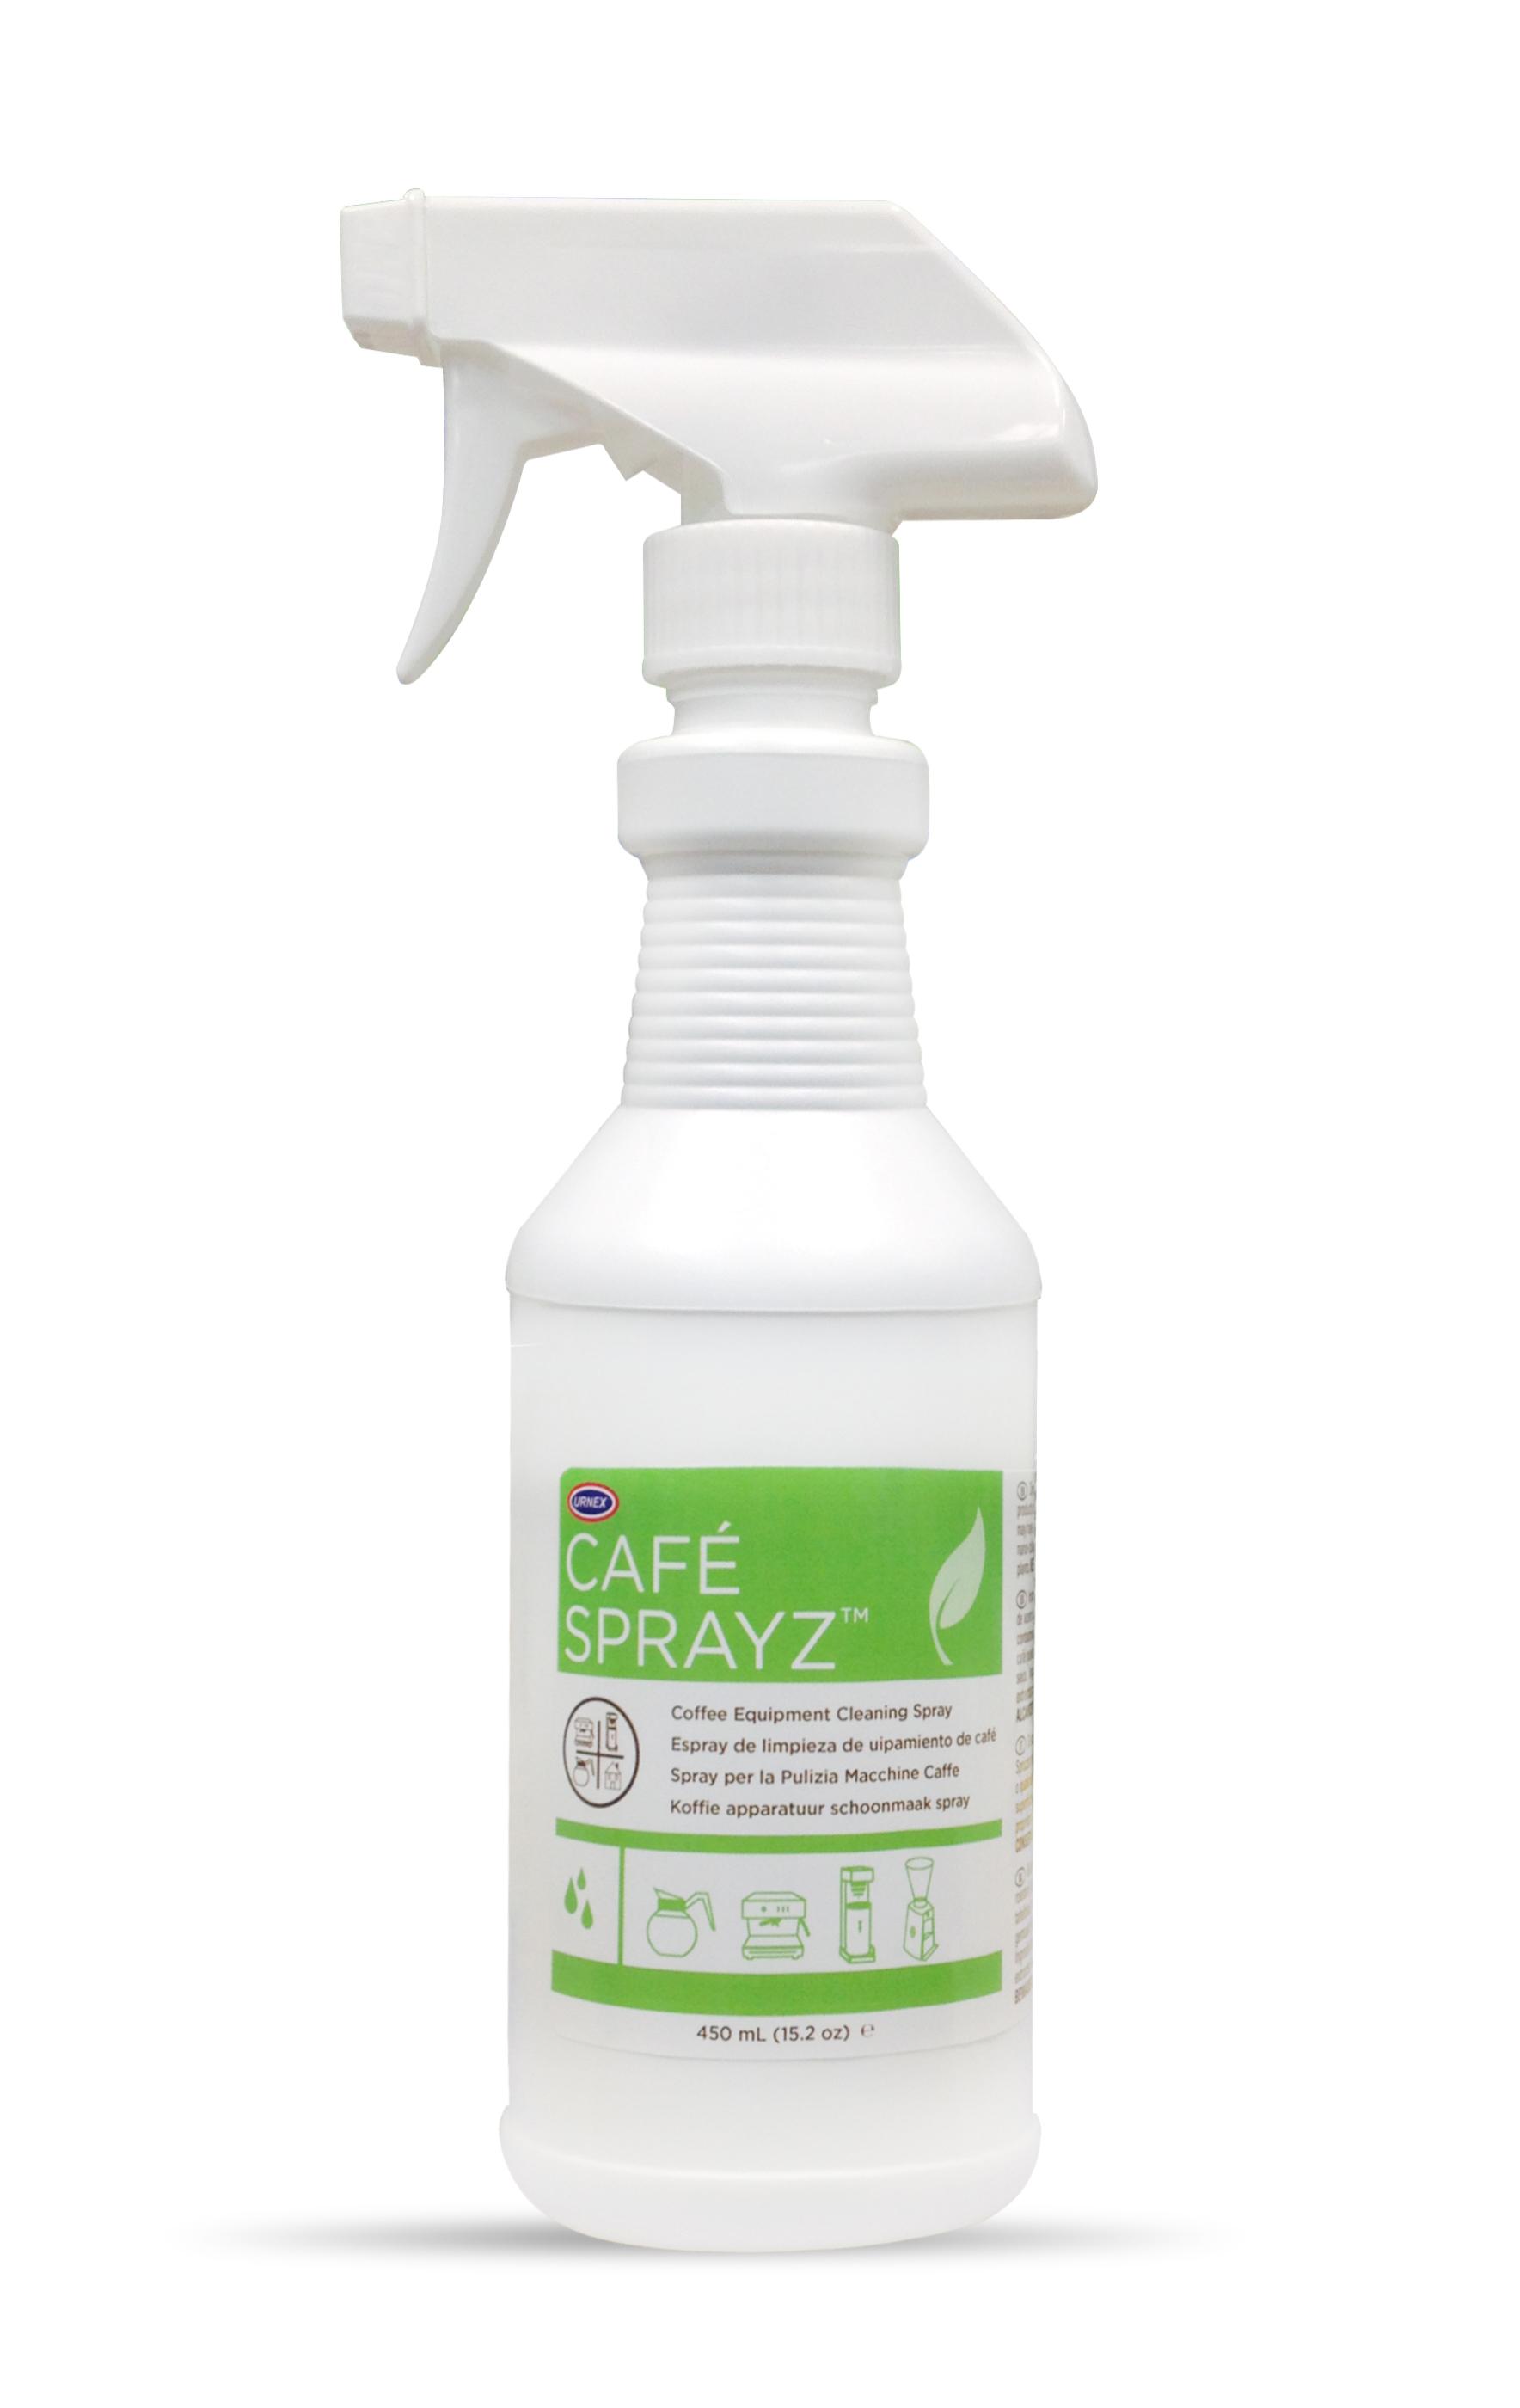 Urnex Cafe SprayZ Coffee Equipment Cleaning Spray